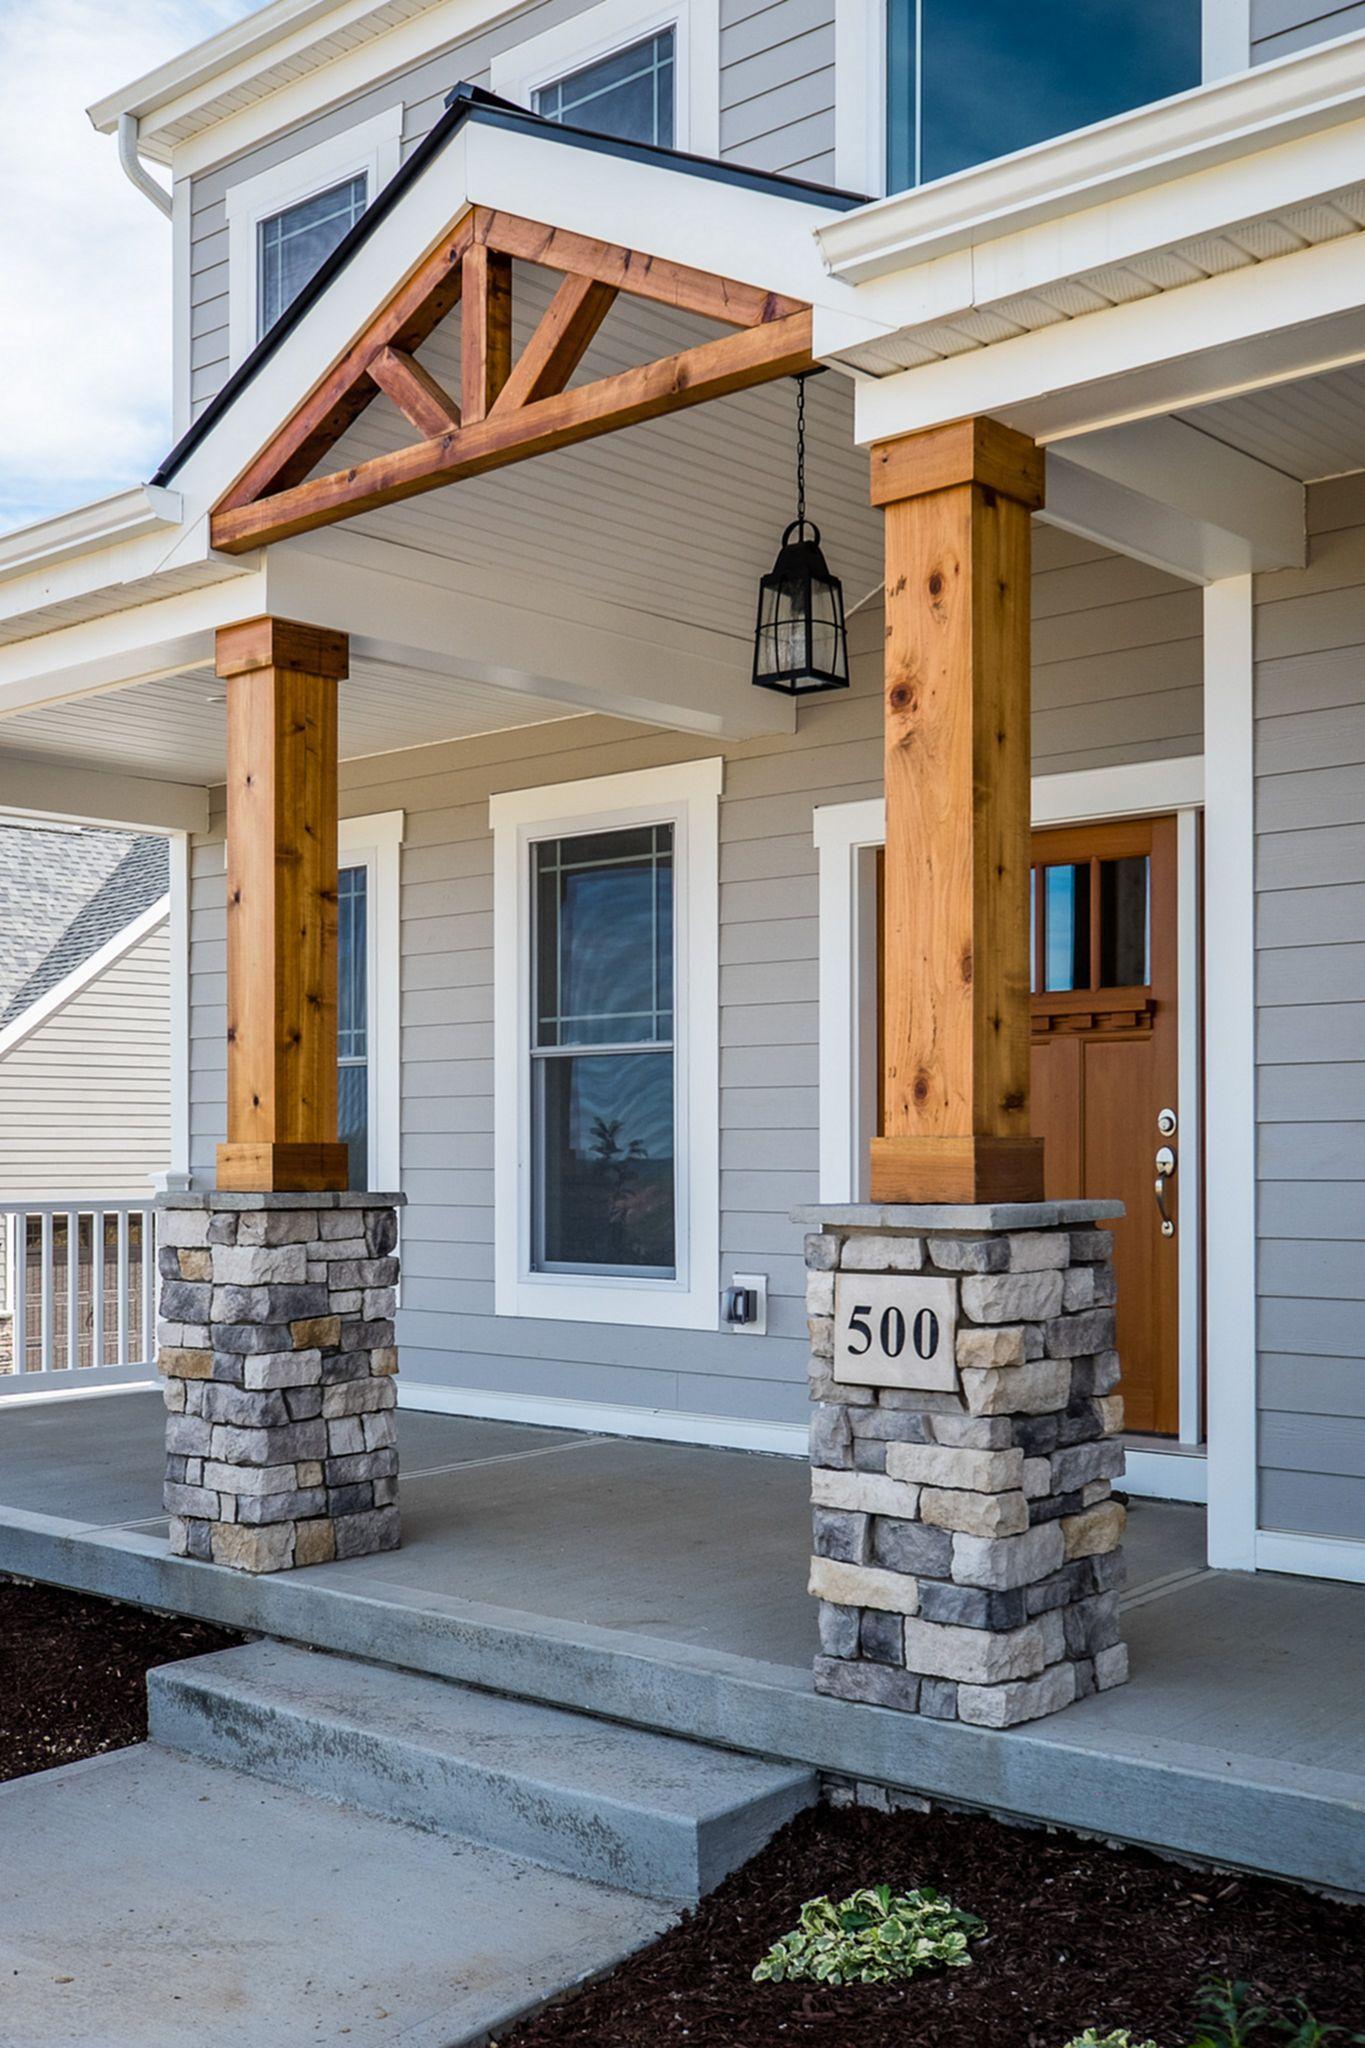 15 Most Unique Home Exterior With Stone Ideas For Amazing Home In 2020 Front Porch Design Porch Design Porch Columns